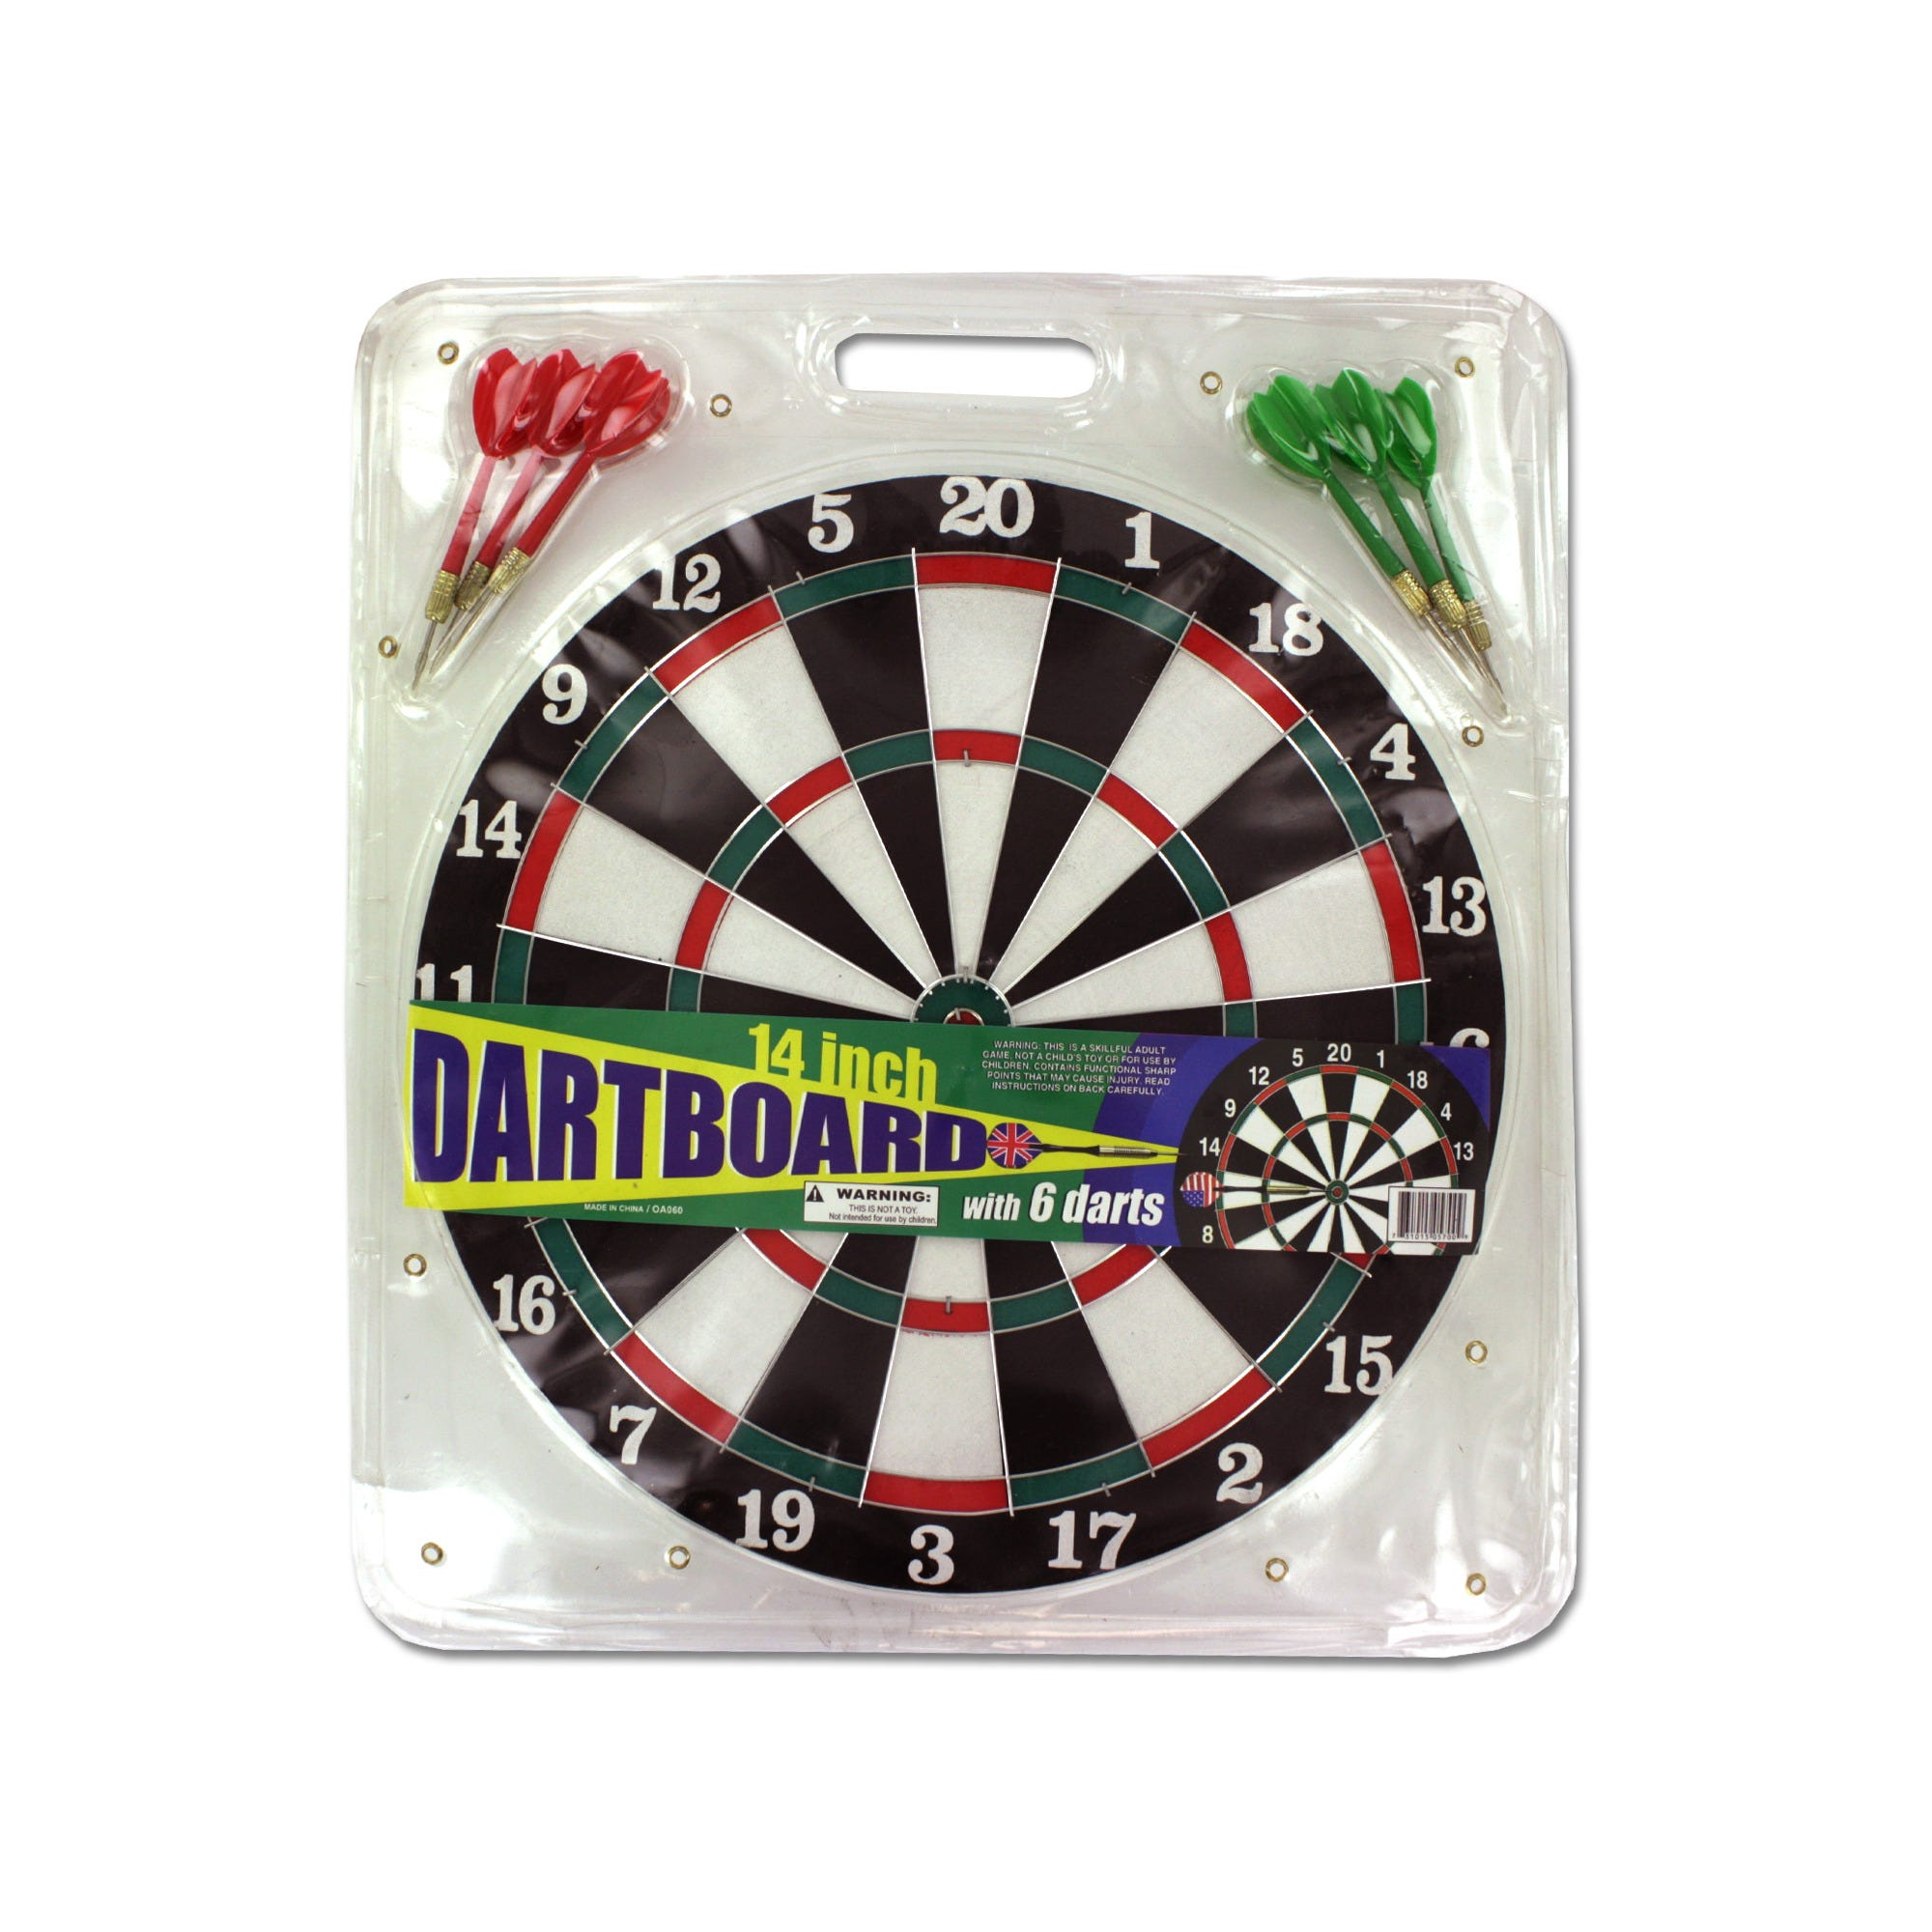 Dartboard with Metal Tip Darts- Qty 4